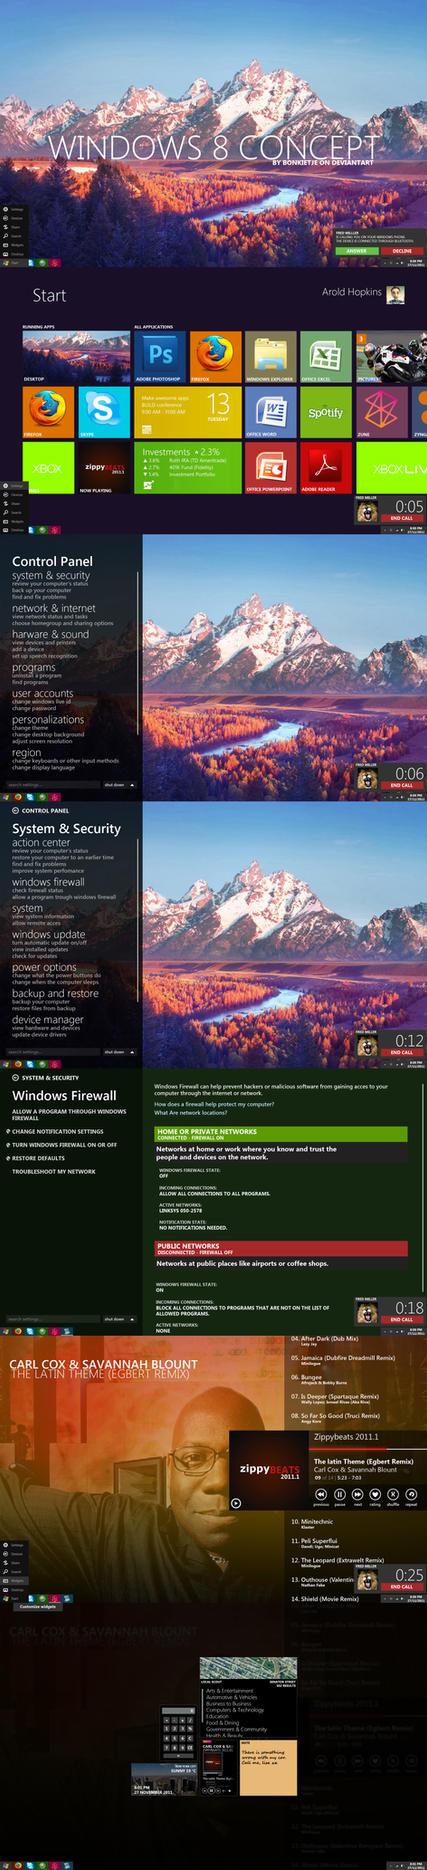 Windows 8 Metro v3.2 by Bonkietje